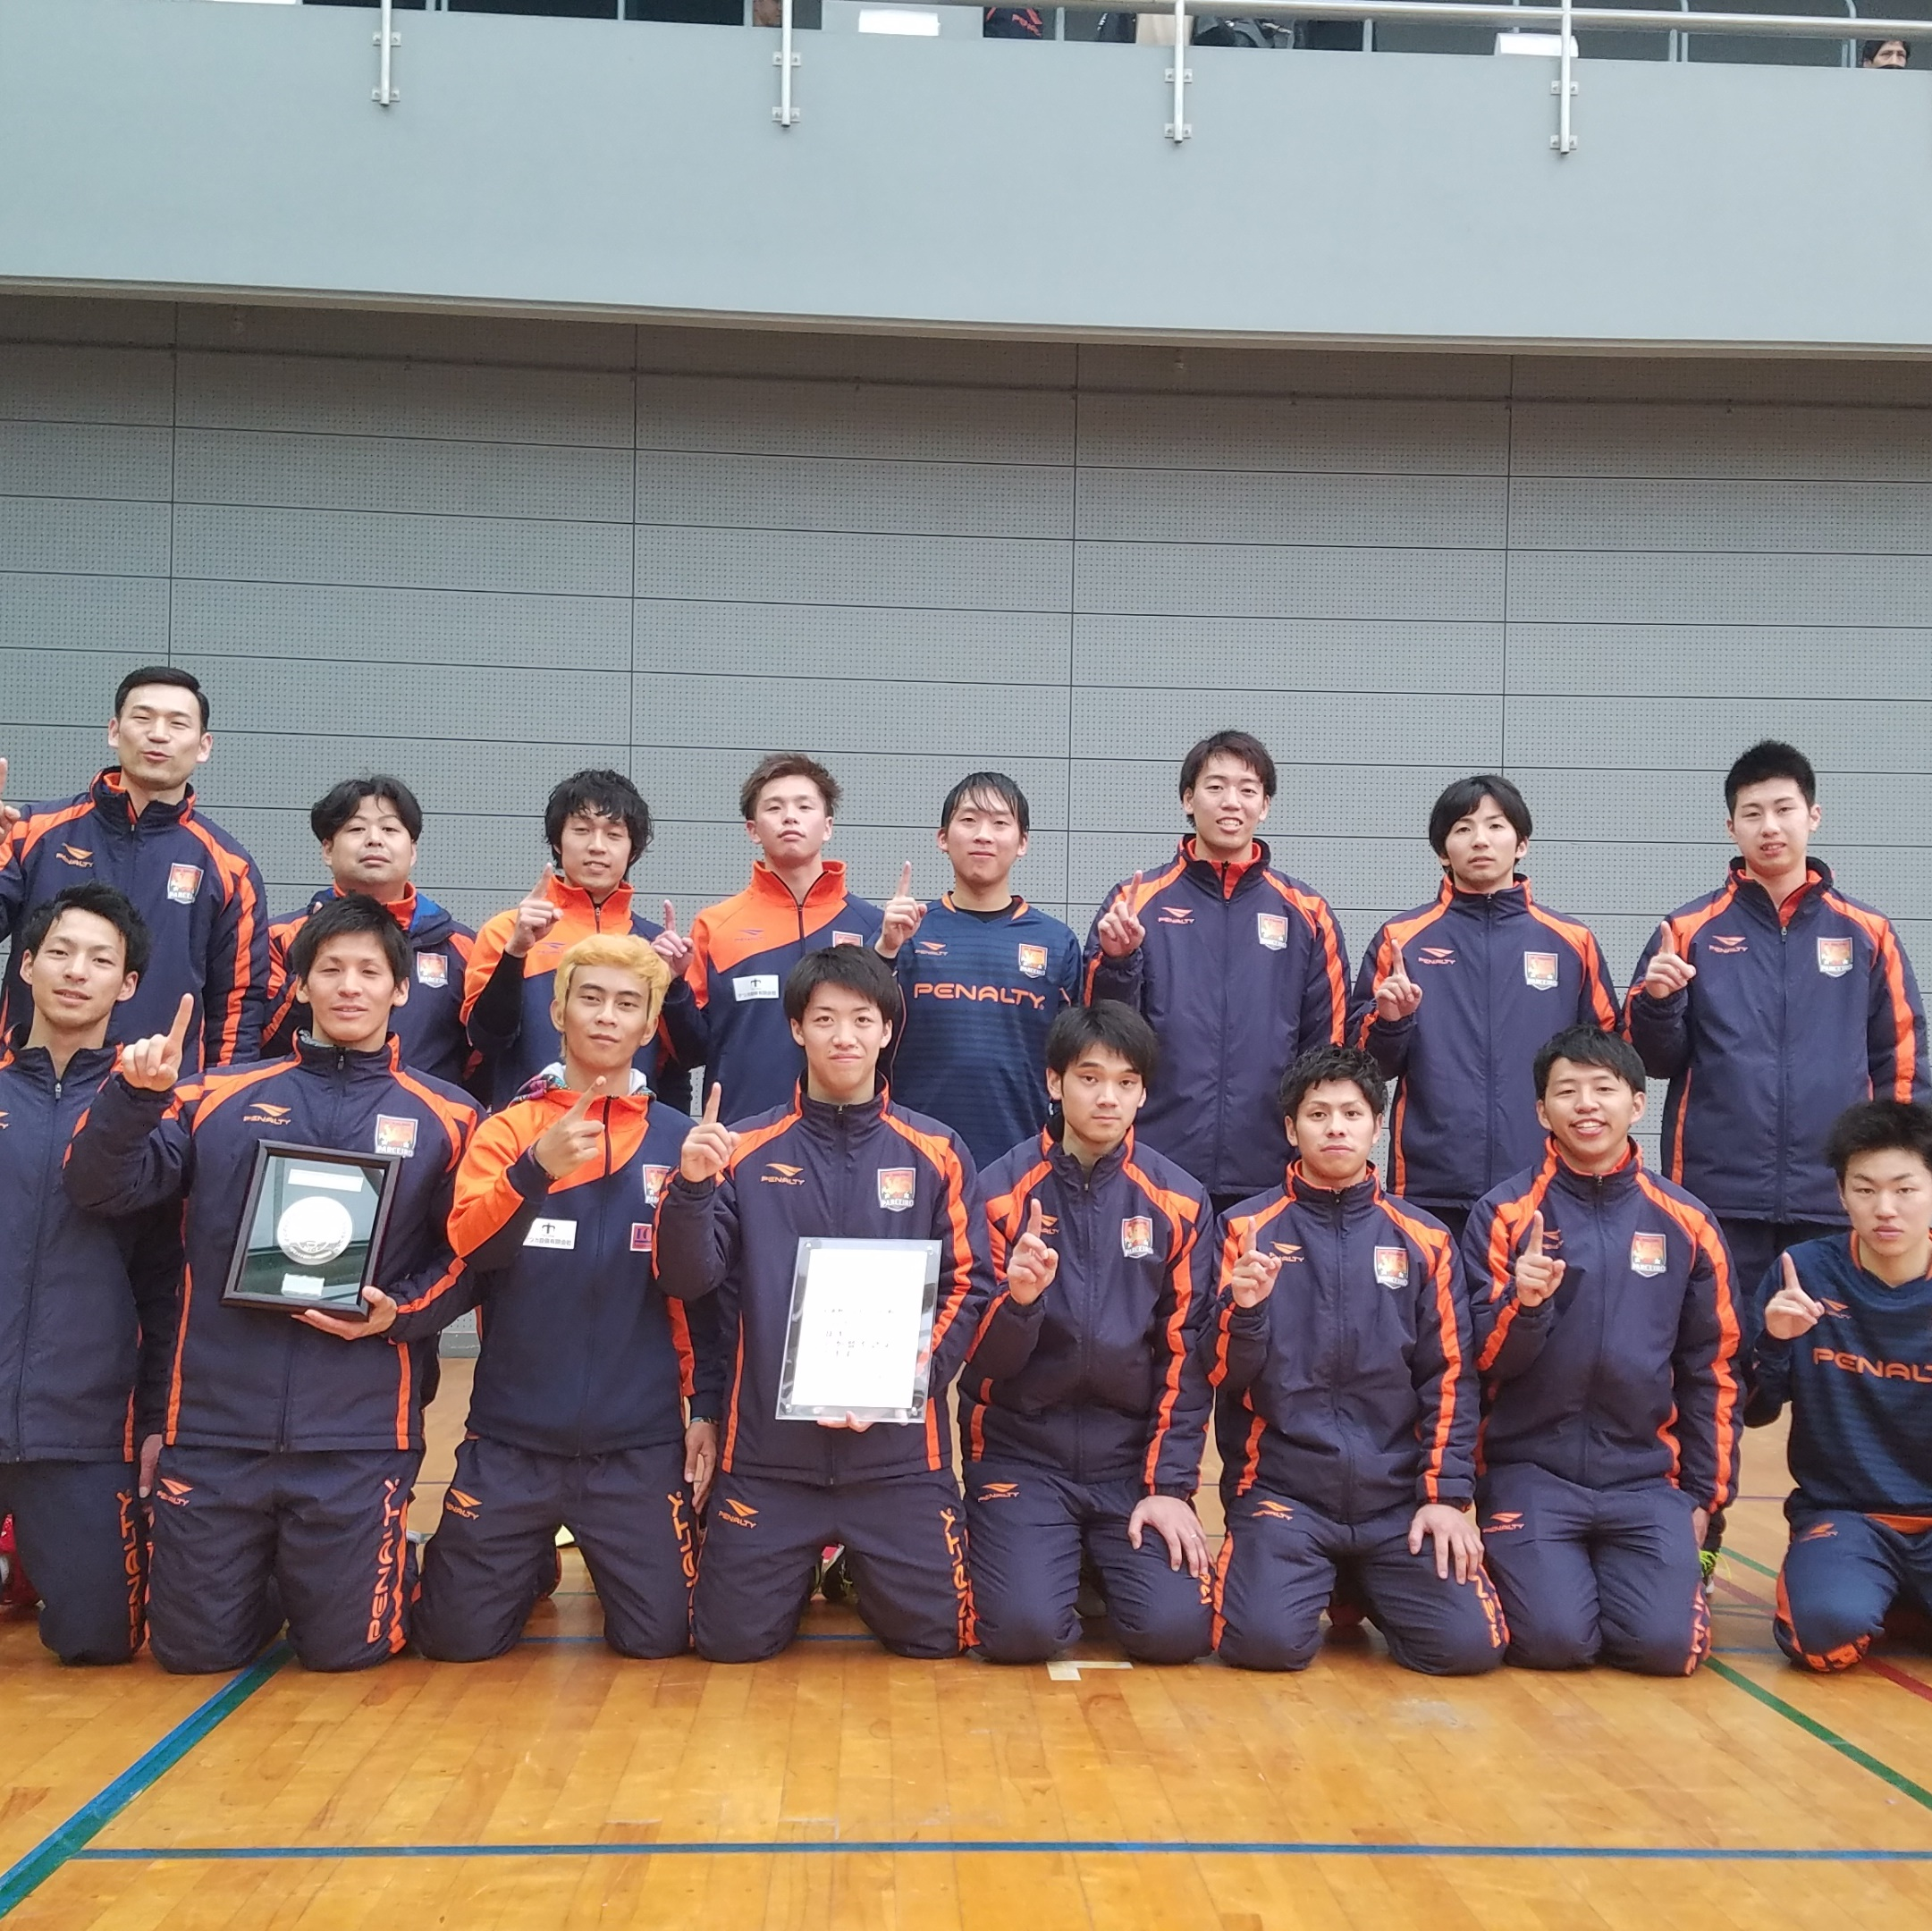 AC長野パルセイロ・バドミントンクラブ 日本リーグ昇格!